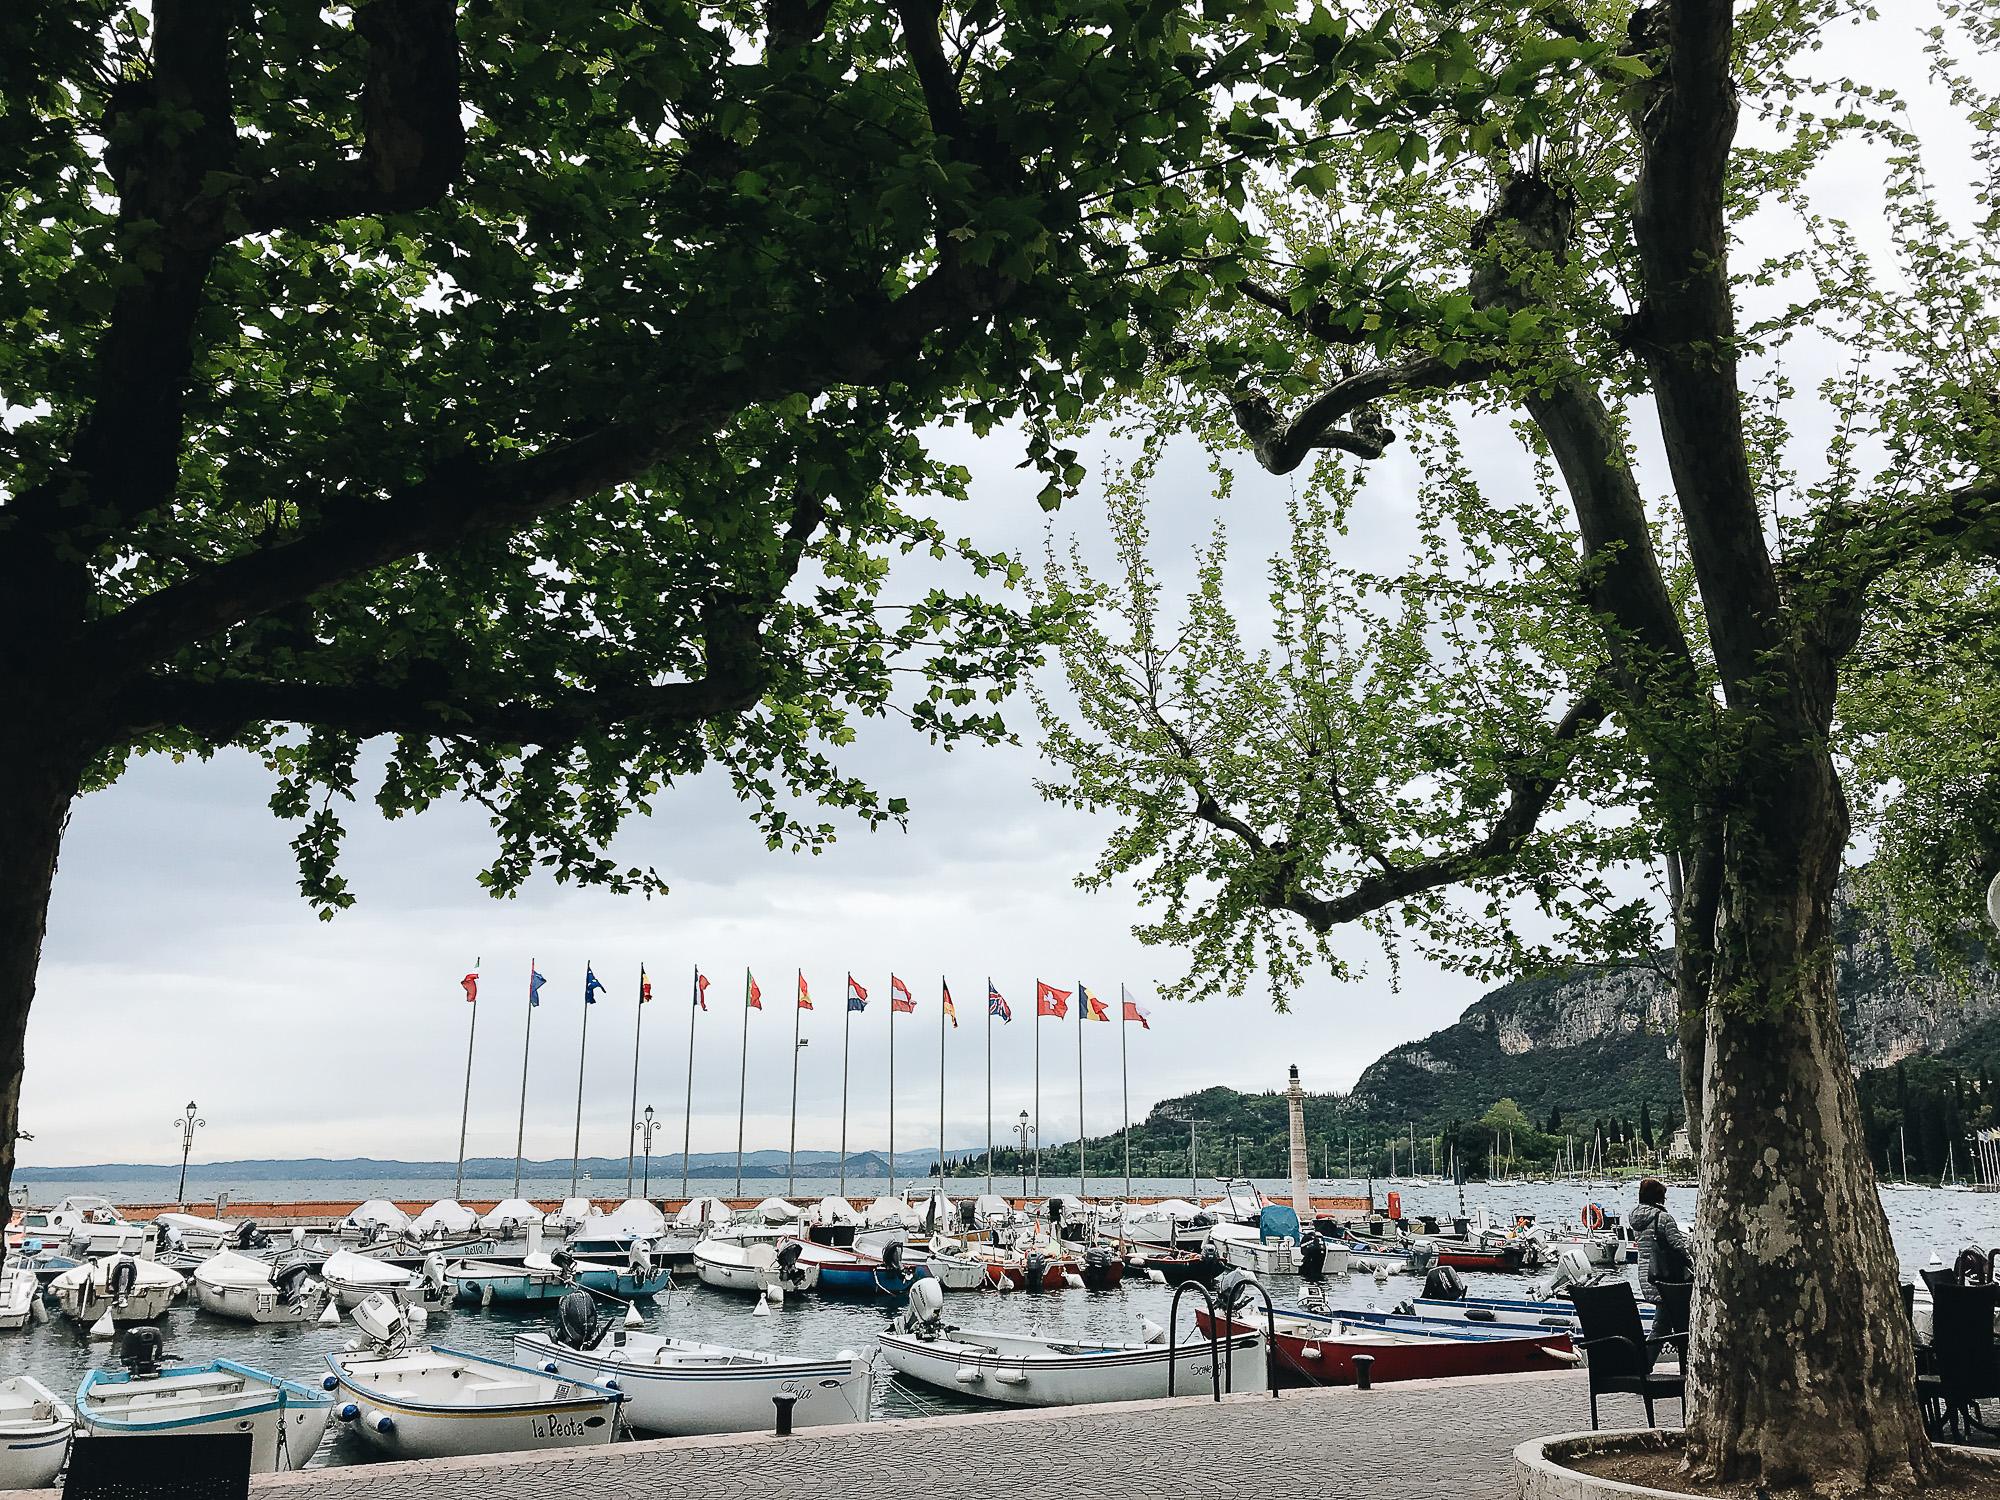 OurBeautifulAdventure-LakeGarda-Italy-Blog-6395.jpg